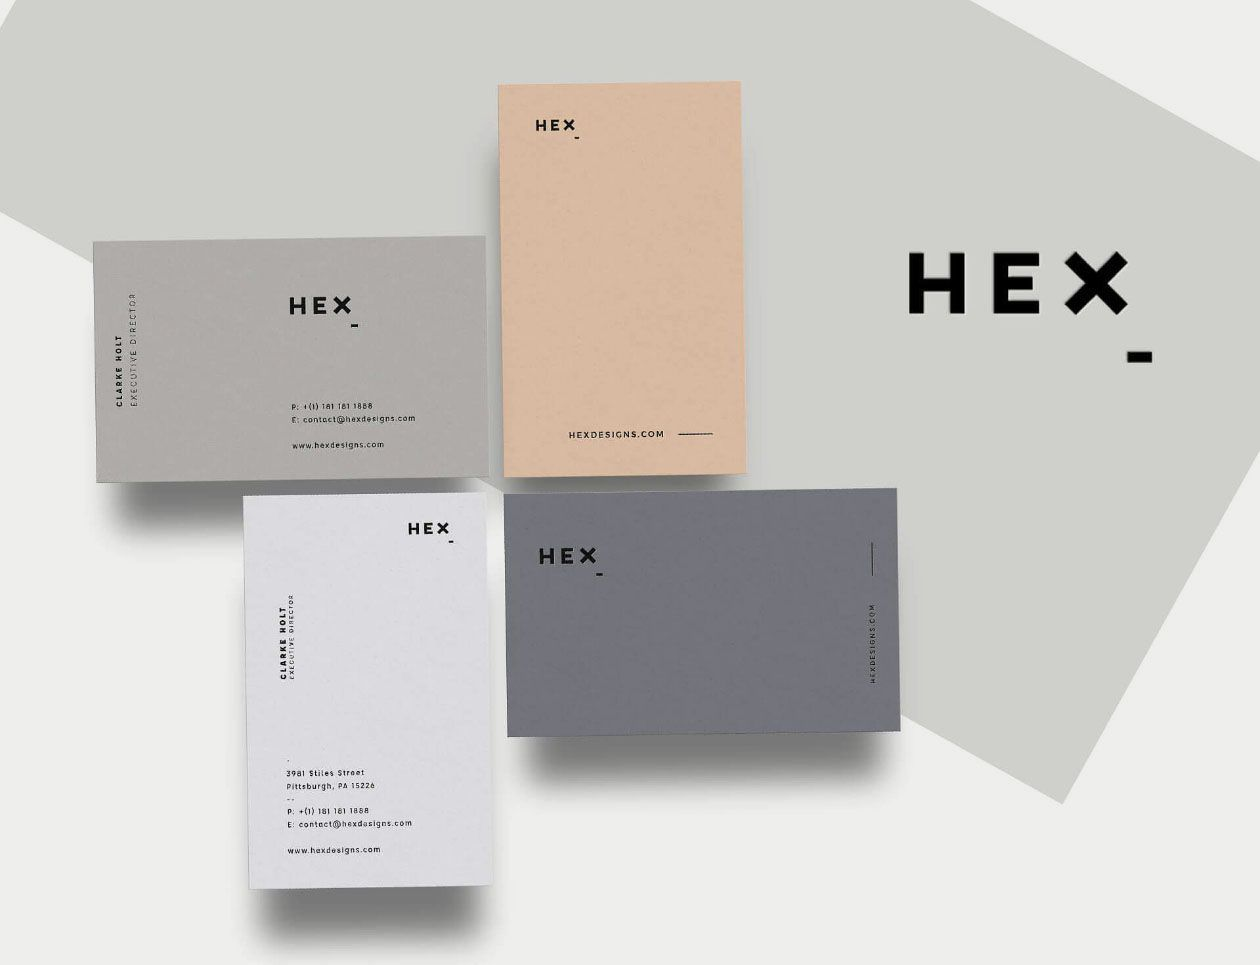 Hex Business Card Template #UniqueBusinessCards | BUSSINES CARD ...